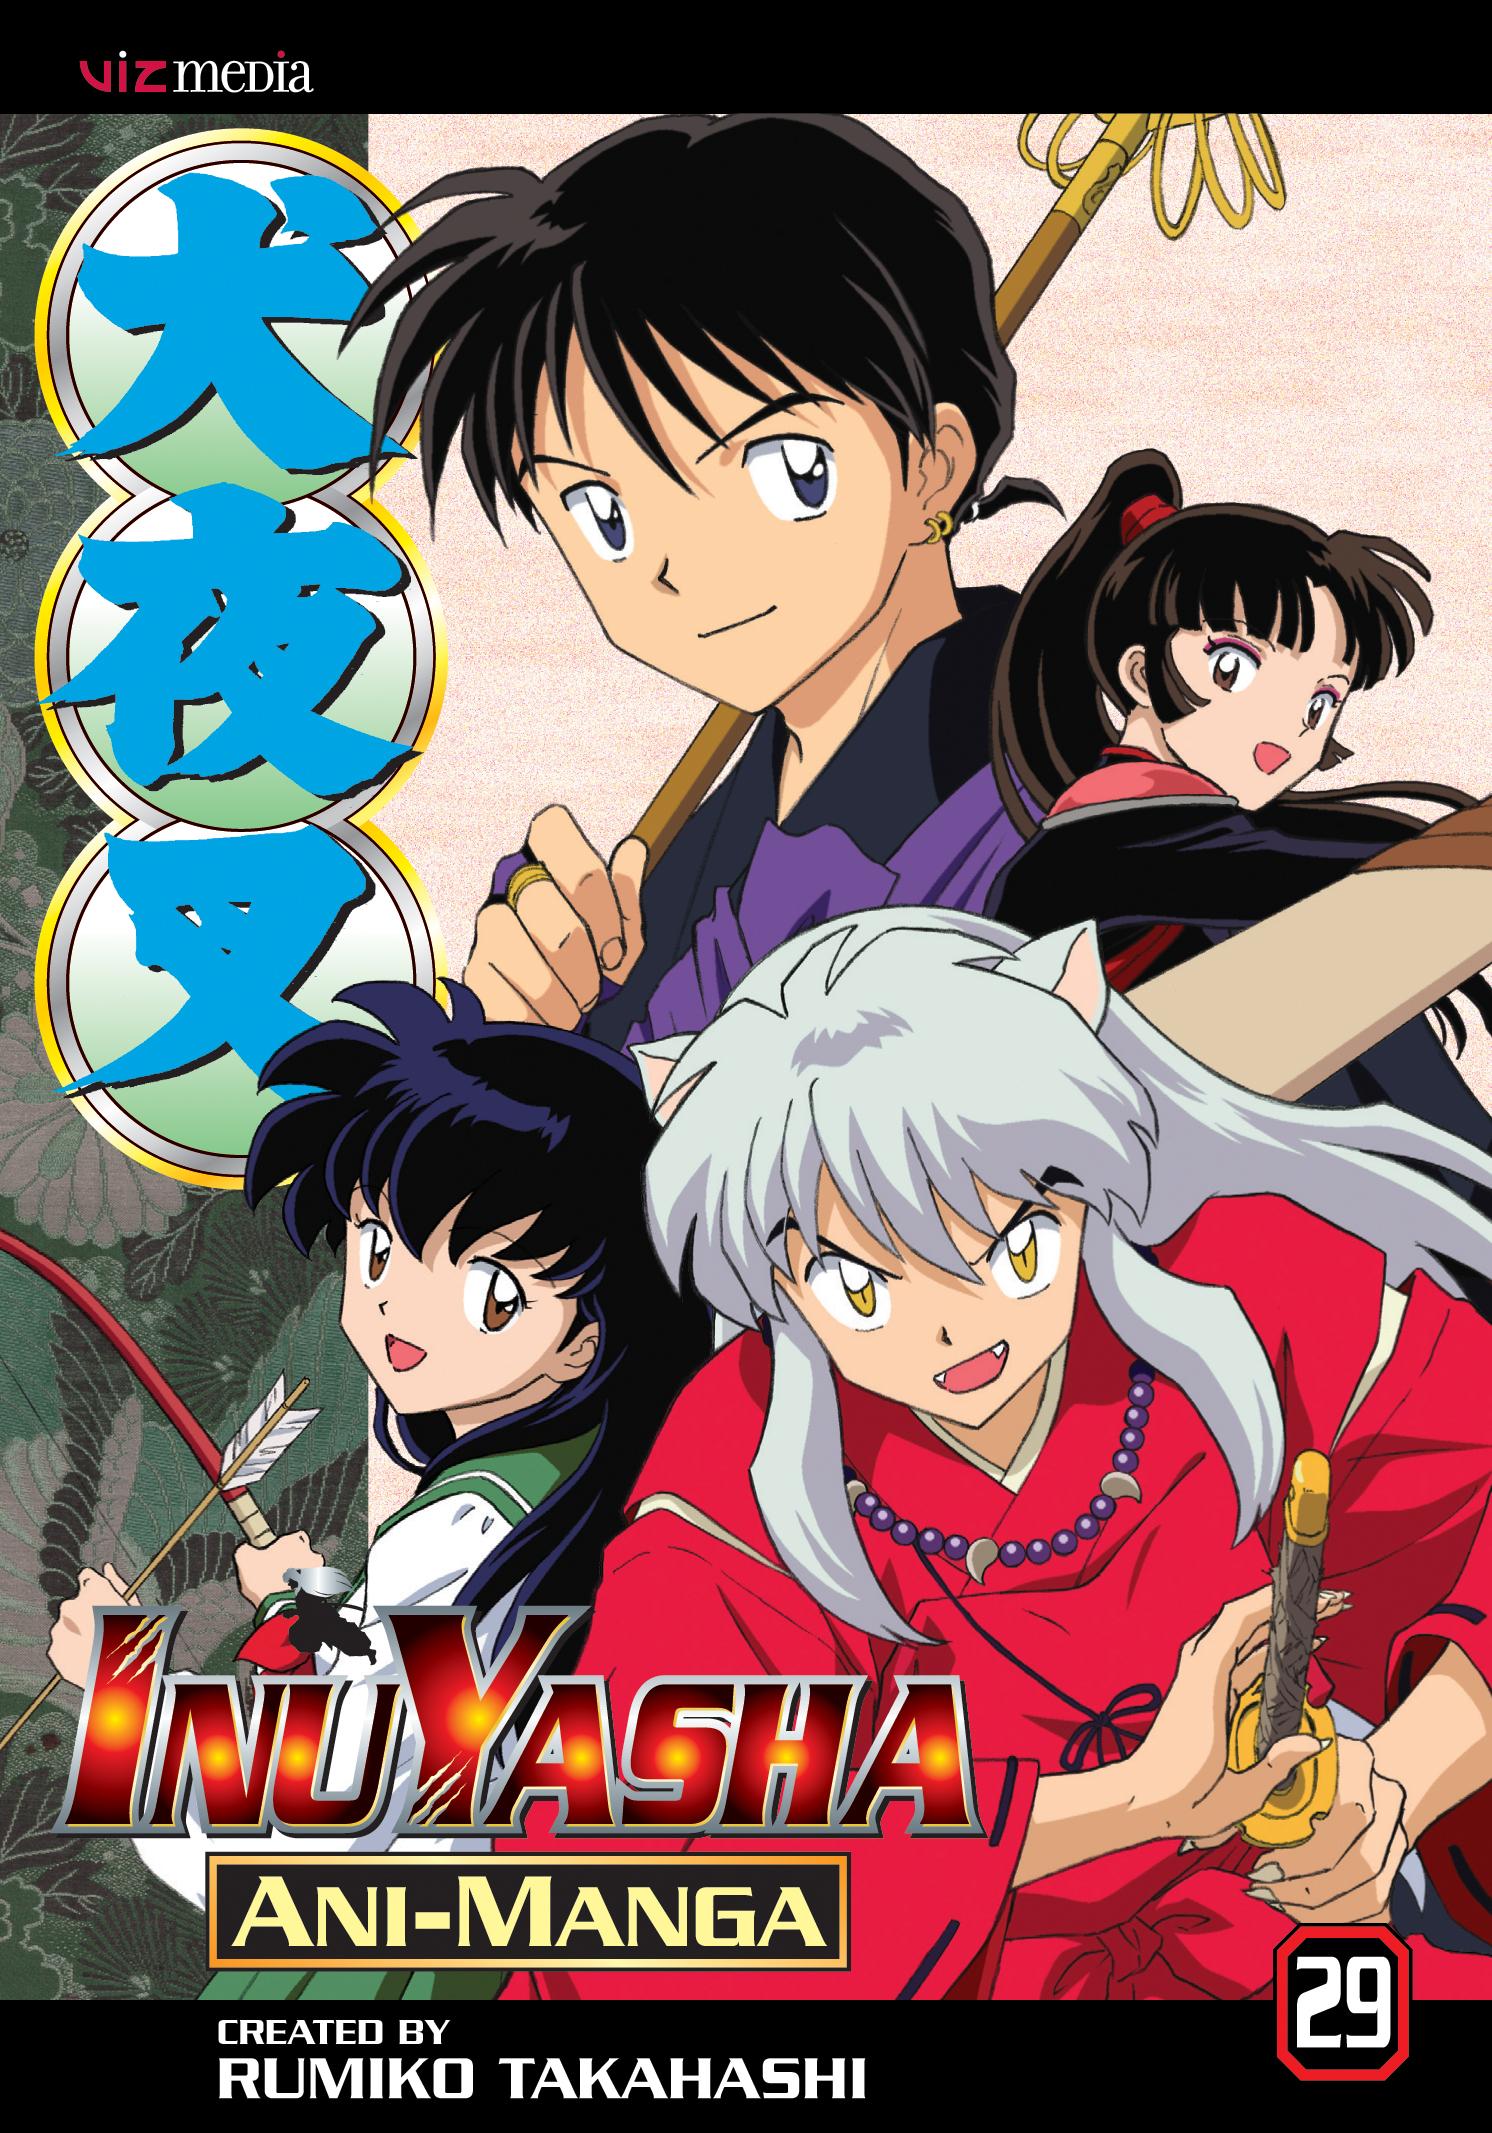 Anime School Book Cover : Inuyasha ani manga vol book by rumiko takahashi